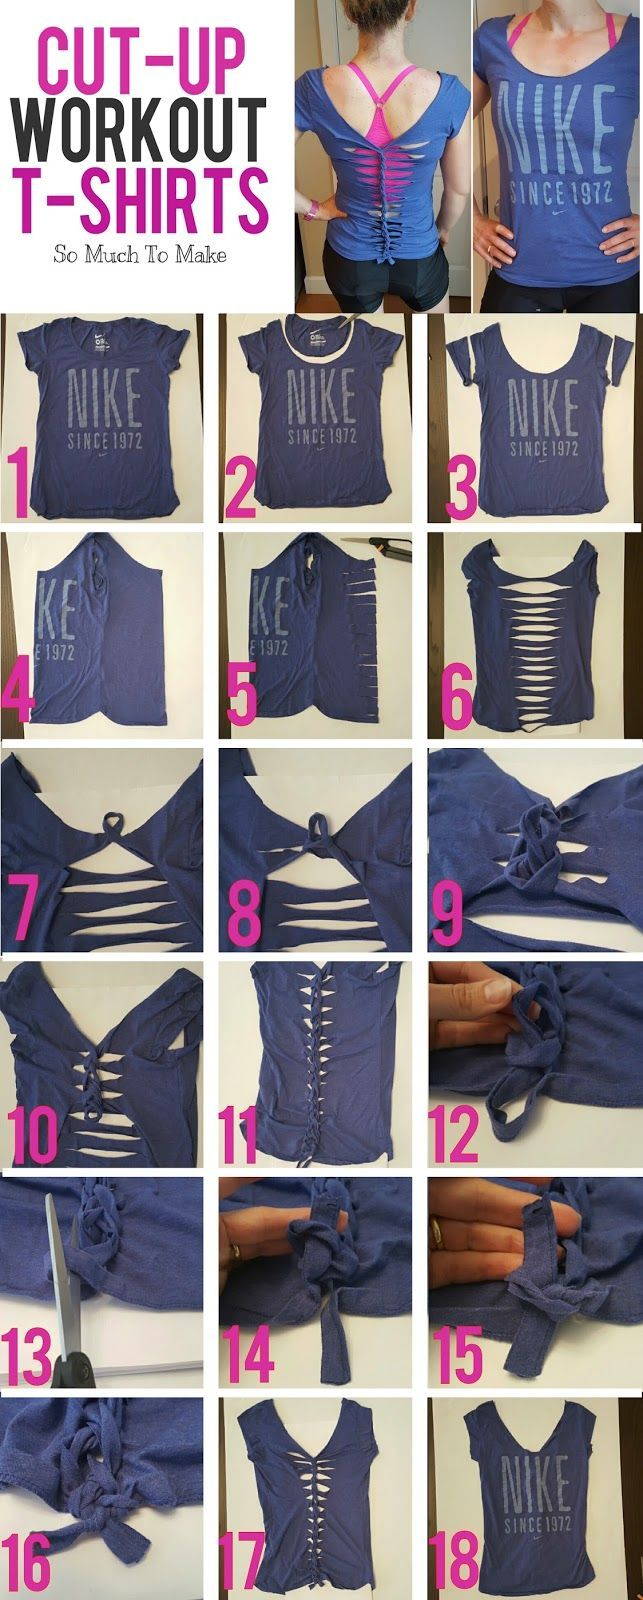 | So Much To Make. DIY repurposed woven t-shirt. No sew fashion.